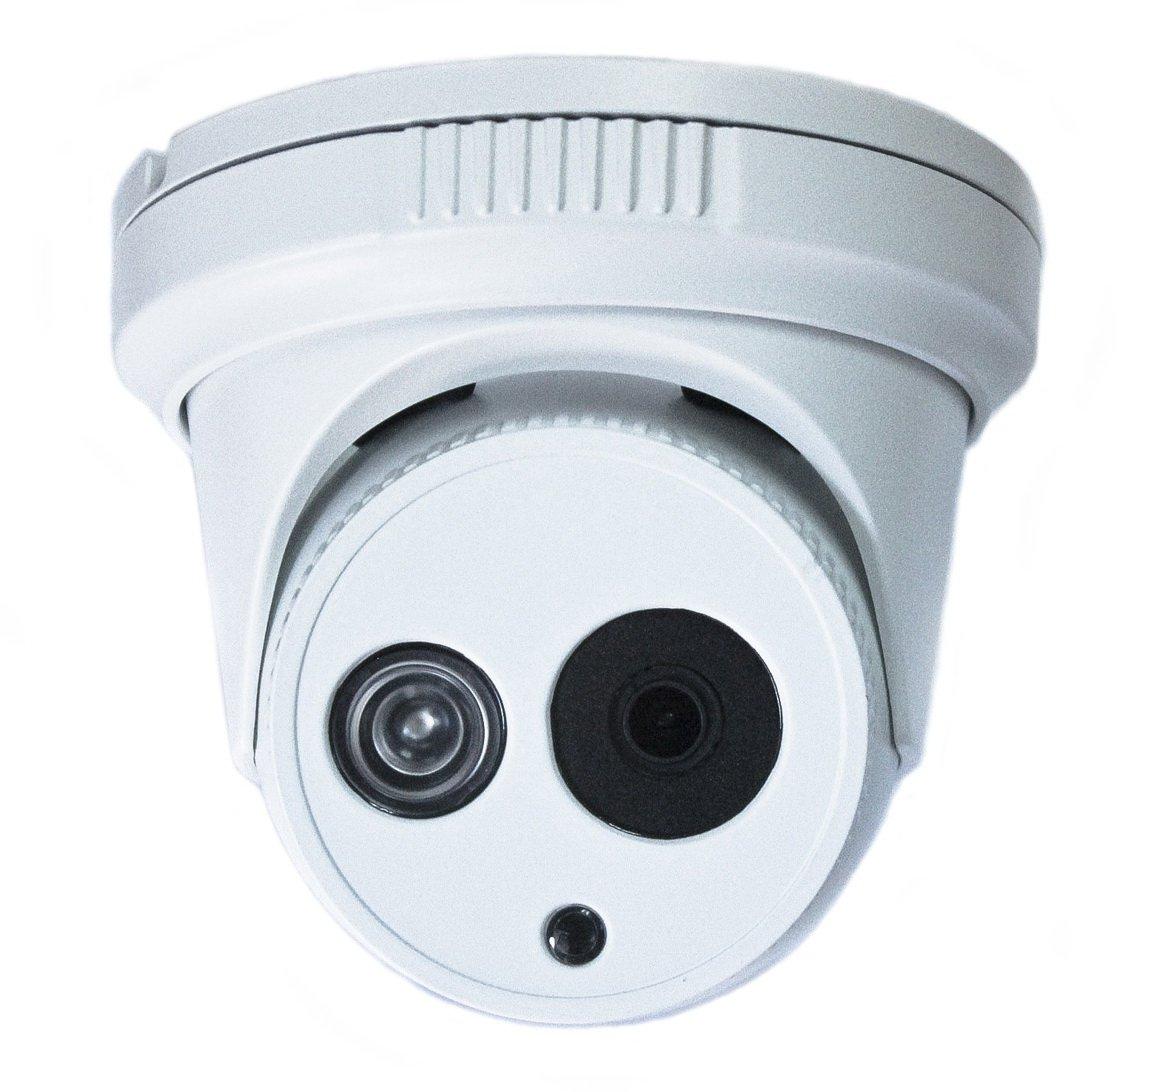 Gawker HD TVI Vandal Proof Turret Camera, 1080P EXIR, IP66 Weather Proof, 3.6mm Lens, IR Smart no Ghost Image, DNR OSD, White Color Metal case, DC12V.